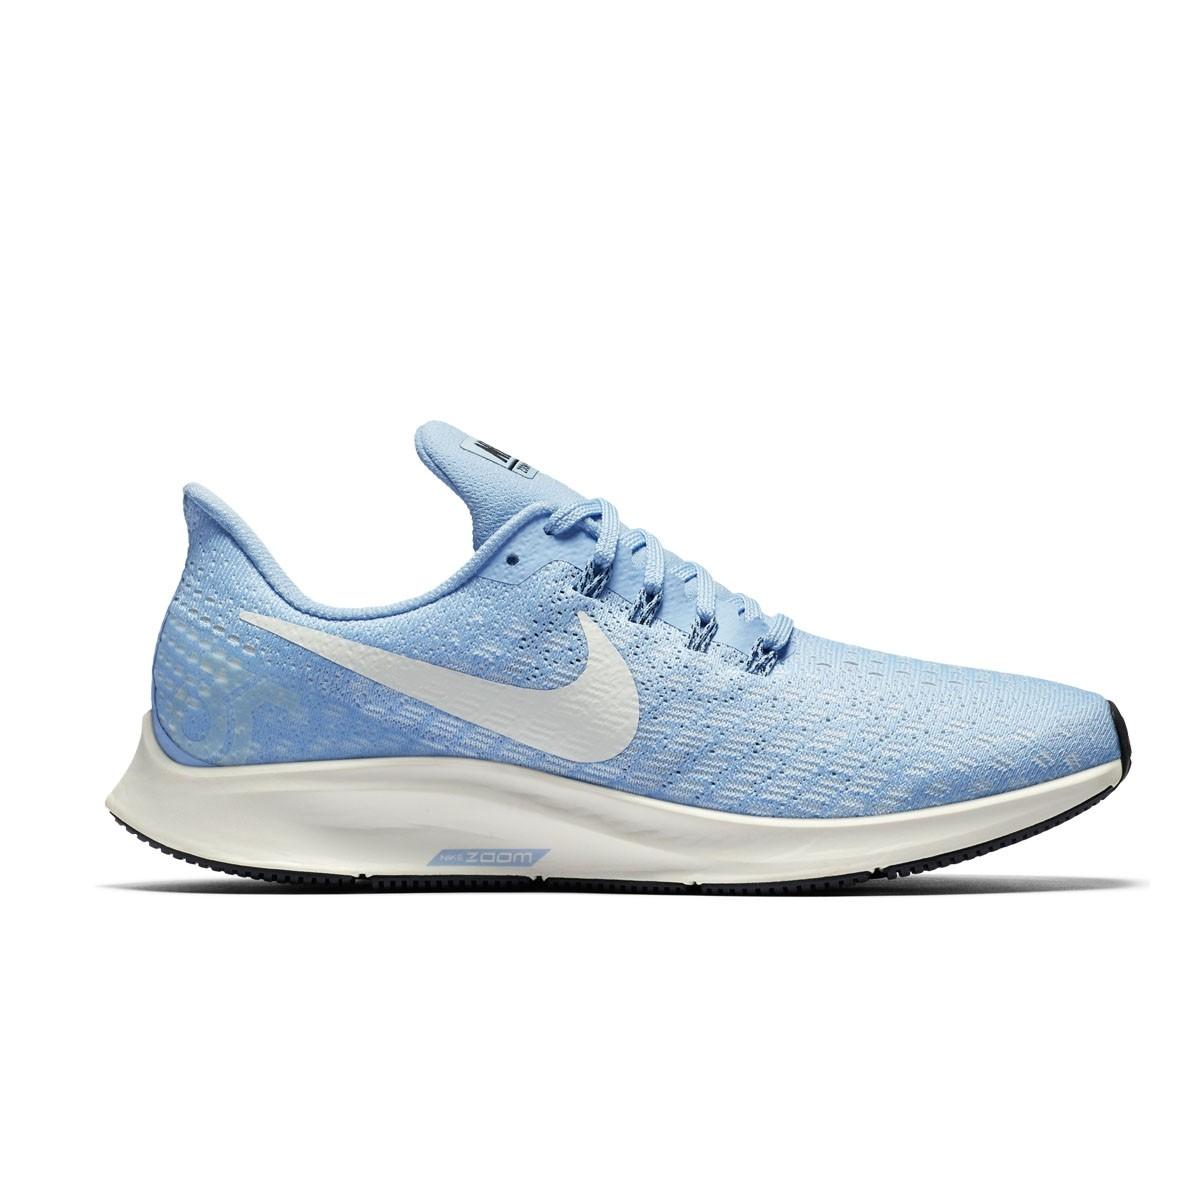 7924af0207b Buy Nike Air Zoom Pegasus 35 Women s  Blue Sky  Basketball shoes ...